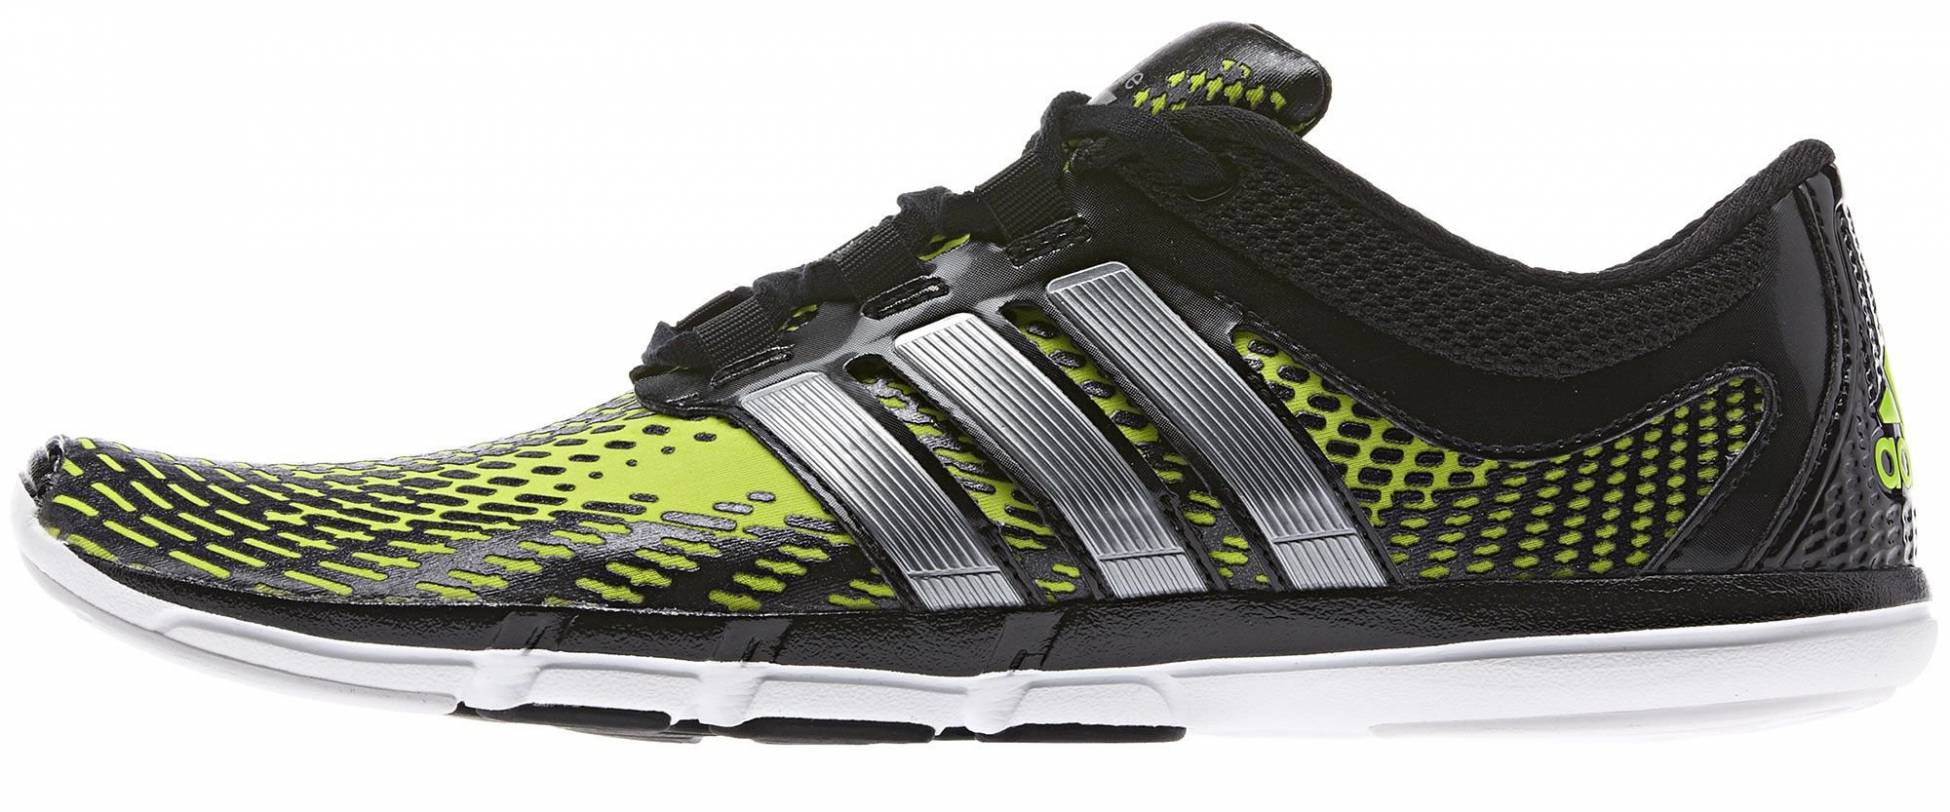 Adidas Running Shoes (228 Models in Stock)   RunRepeat